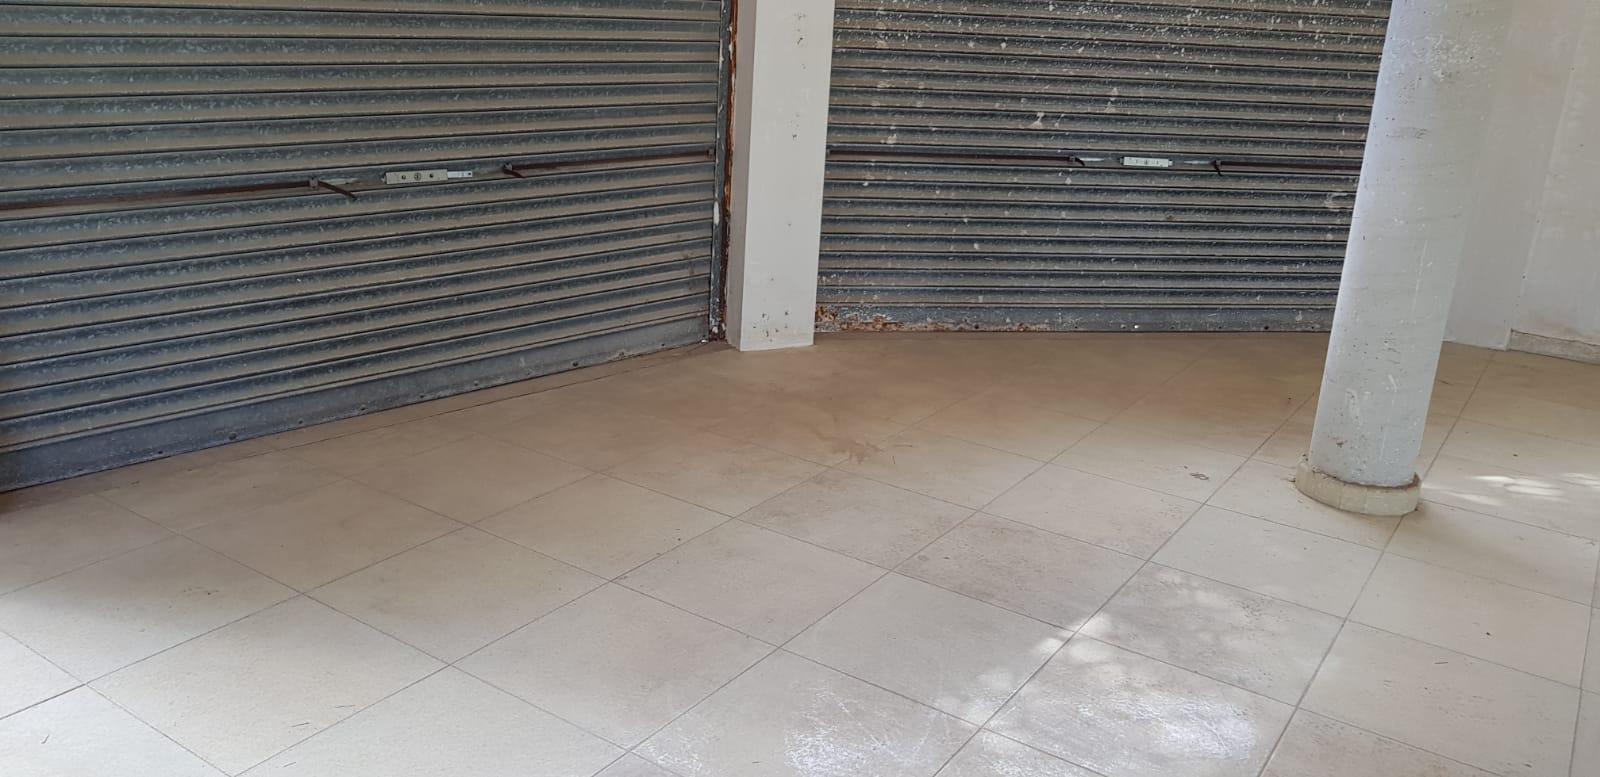 Local en venta en Calvià, Baleares, Calle Vista de la Mar, 154.600 €, 181 m2